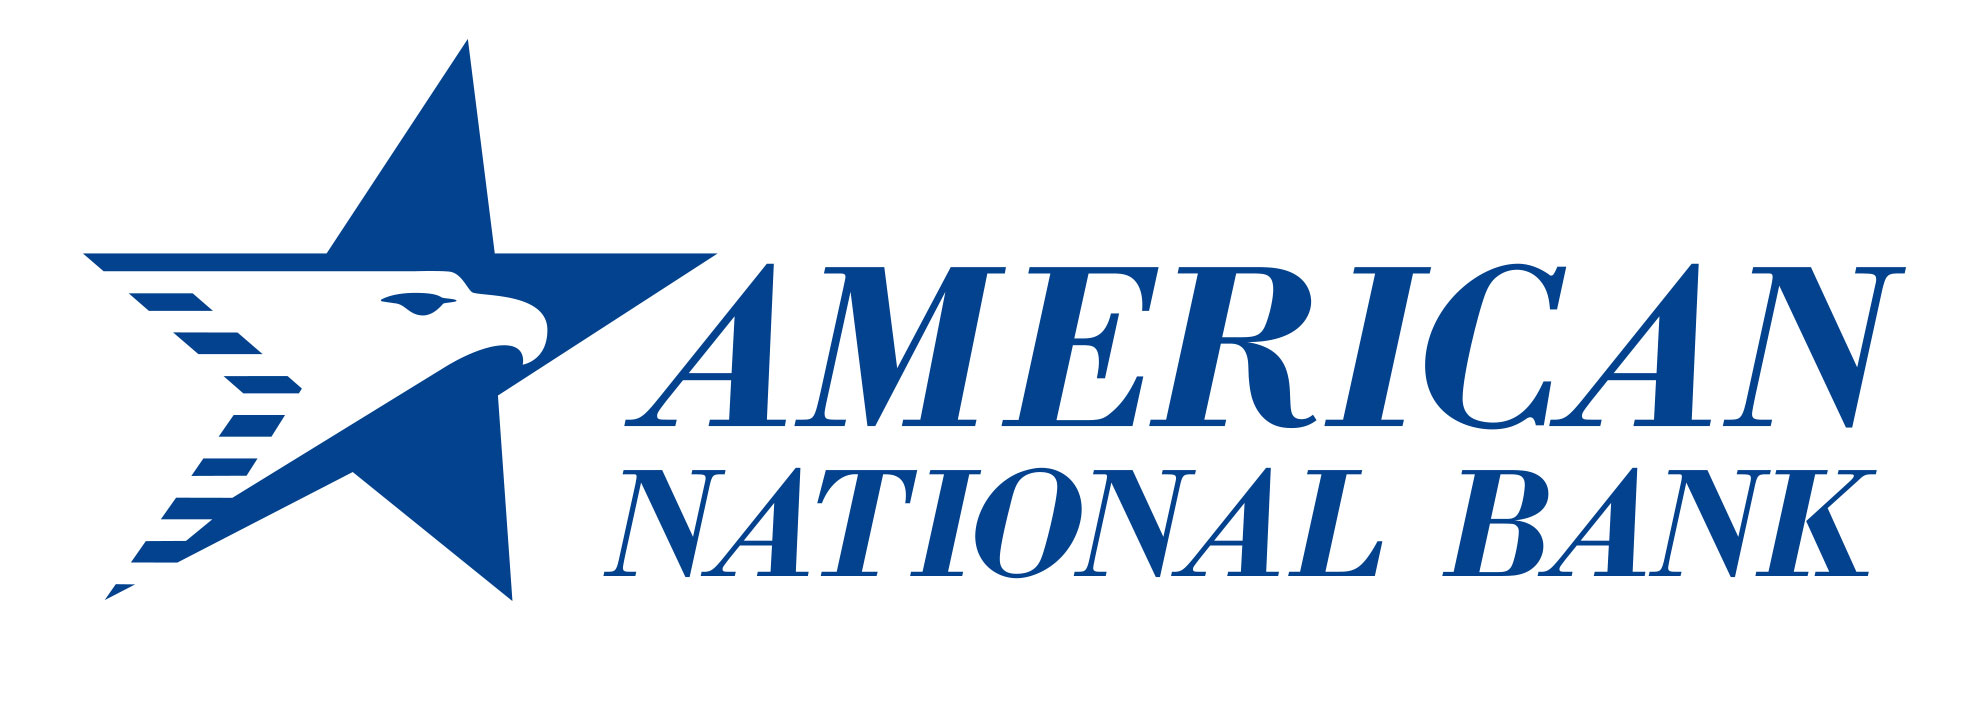 Jennifer Coyle American National Bank